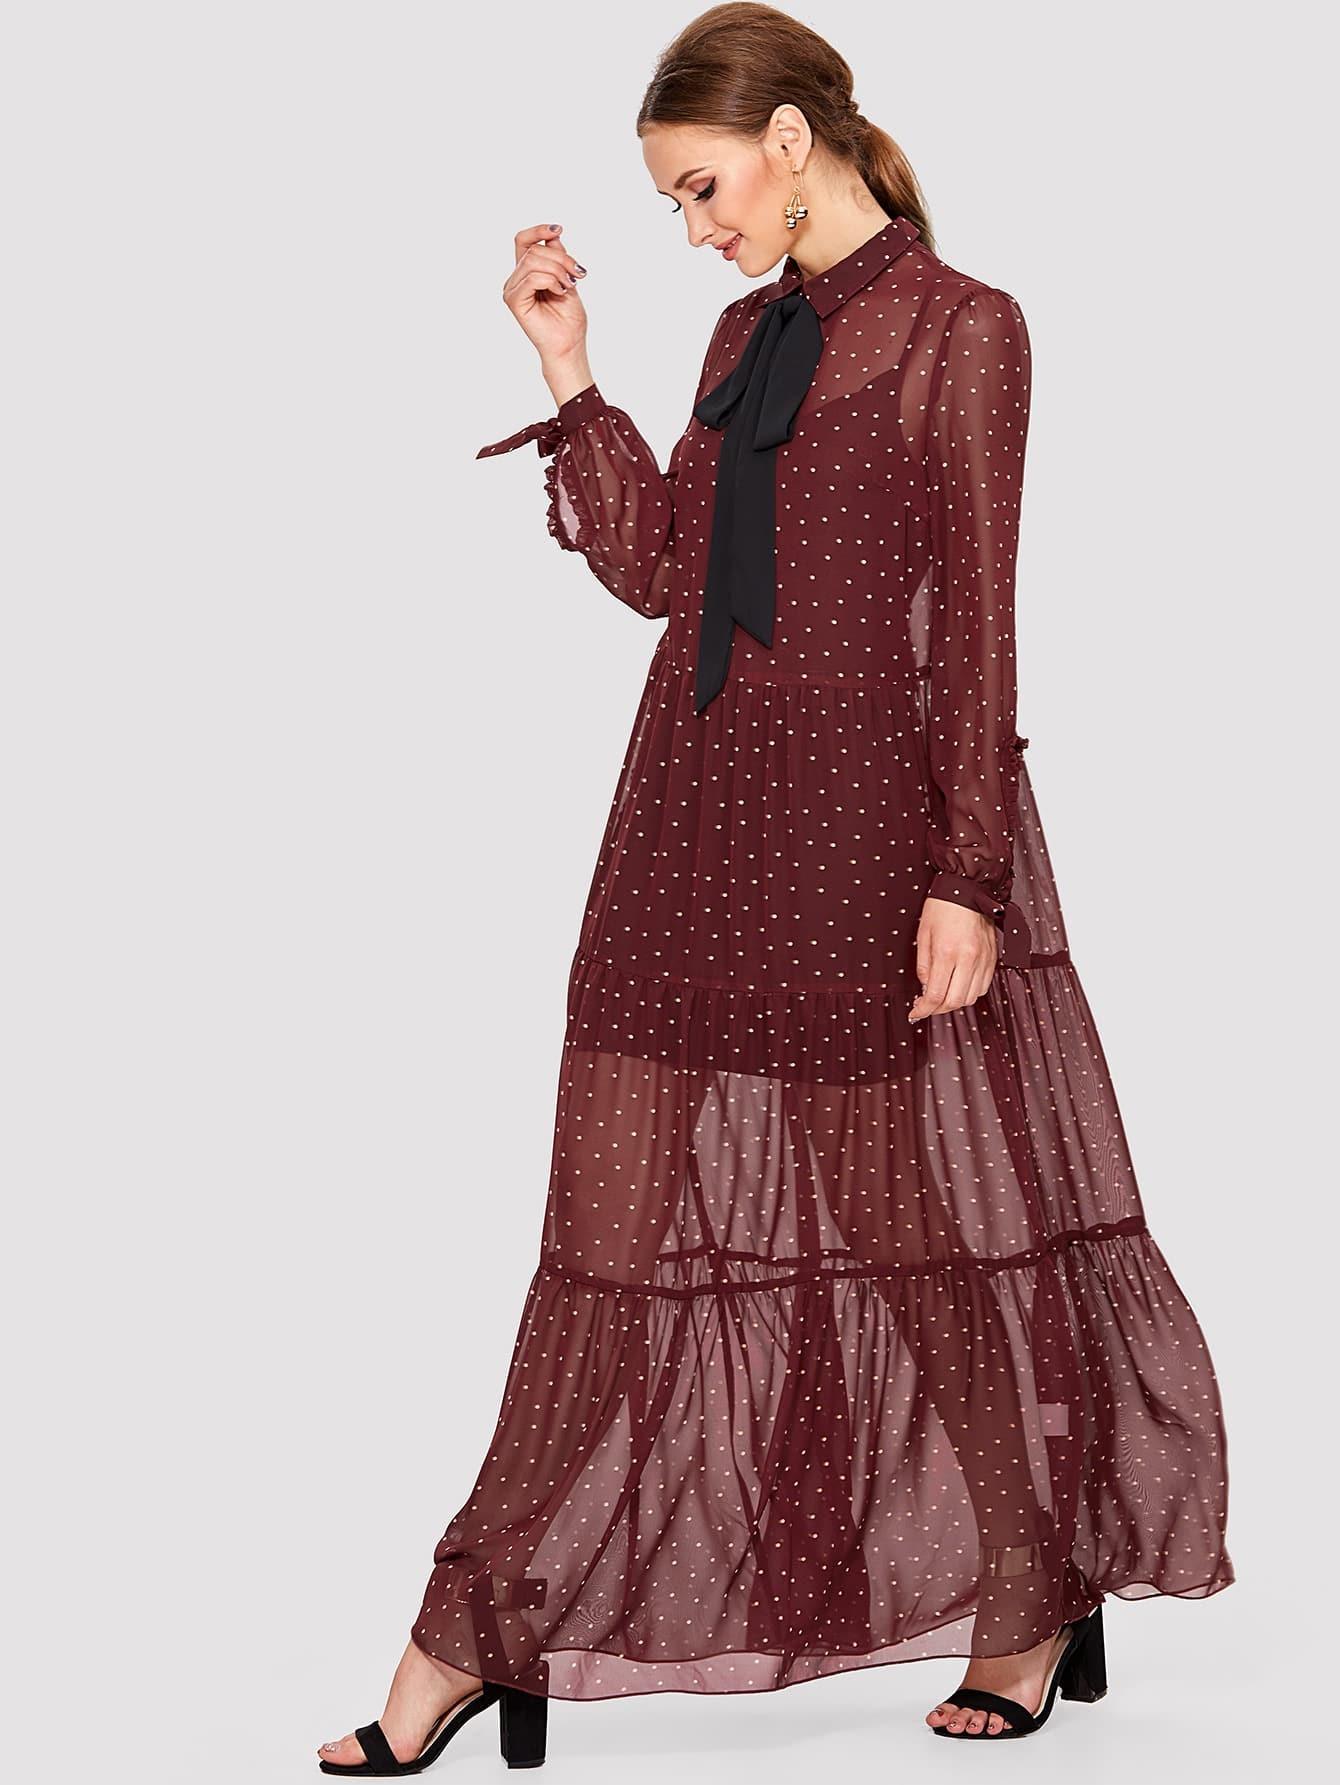 Contrast Tie Neck Knot Cuff Ruffle Trim Dress tie cuff drop waist dress